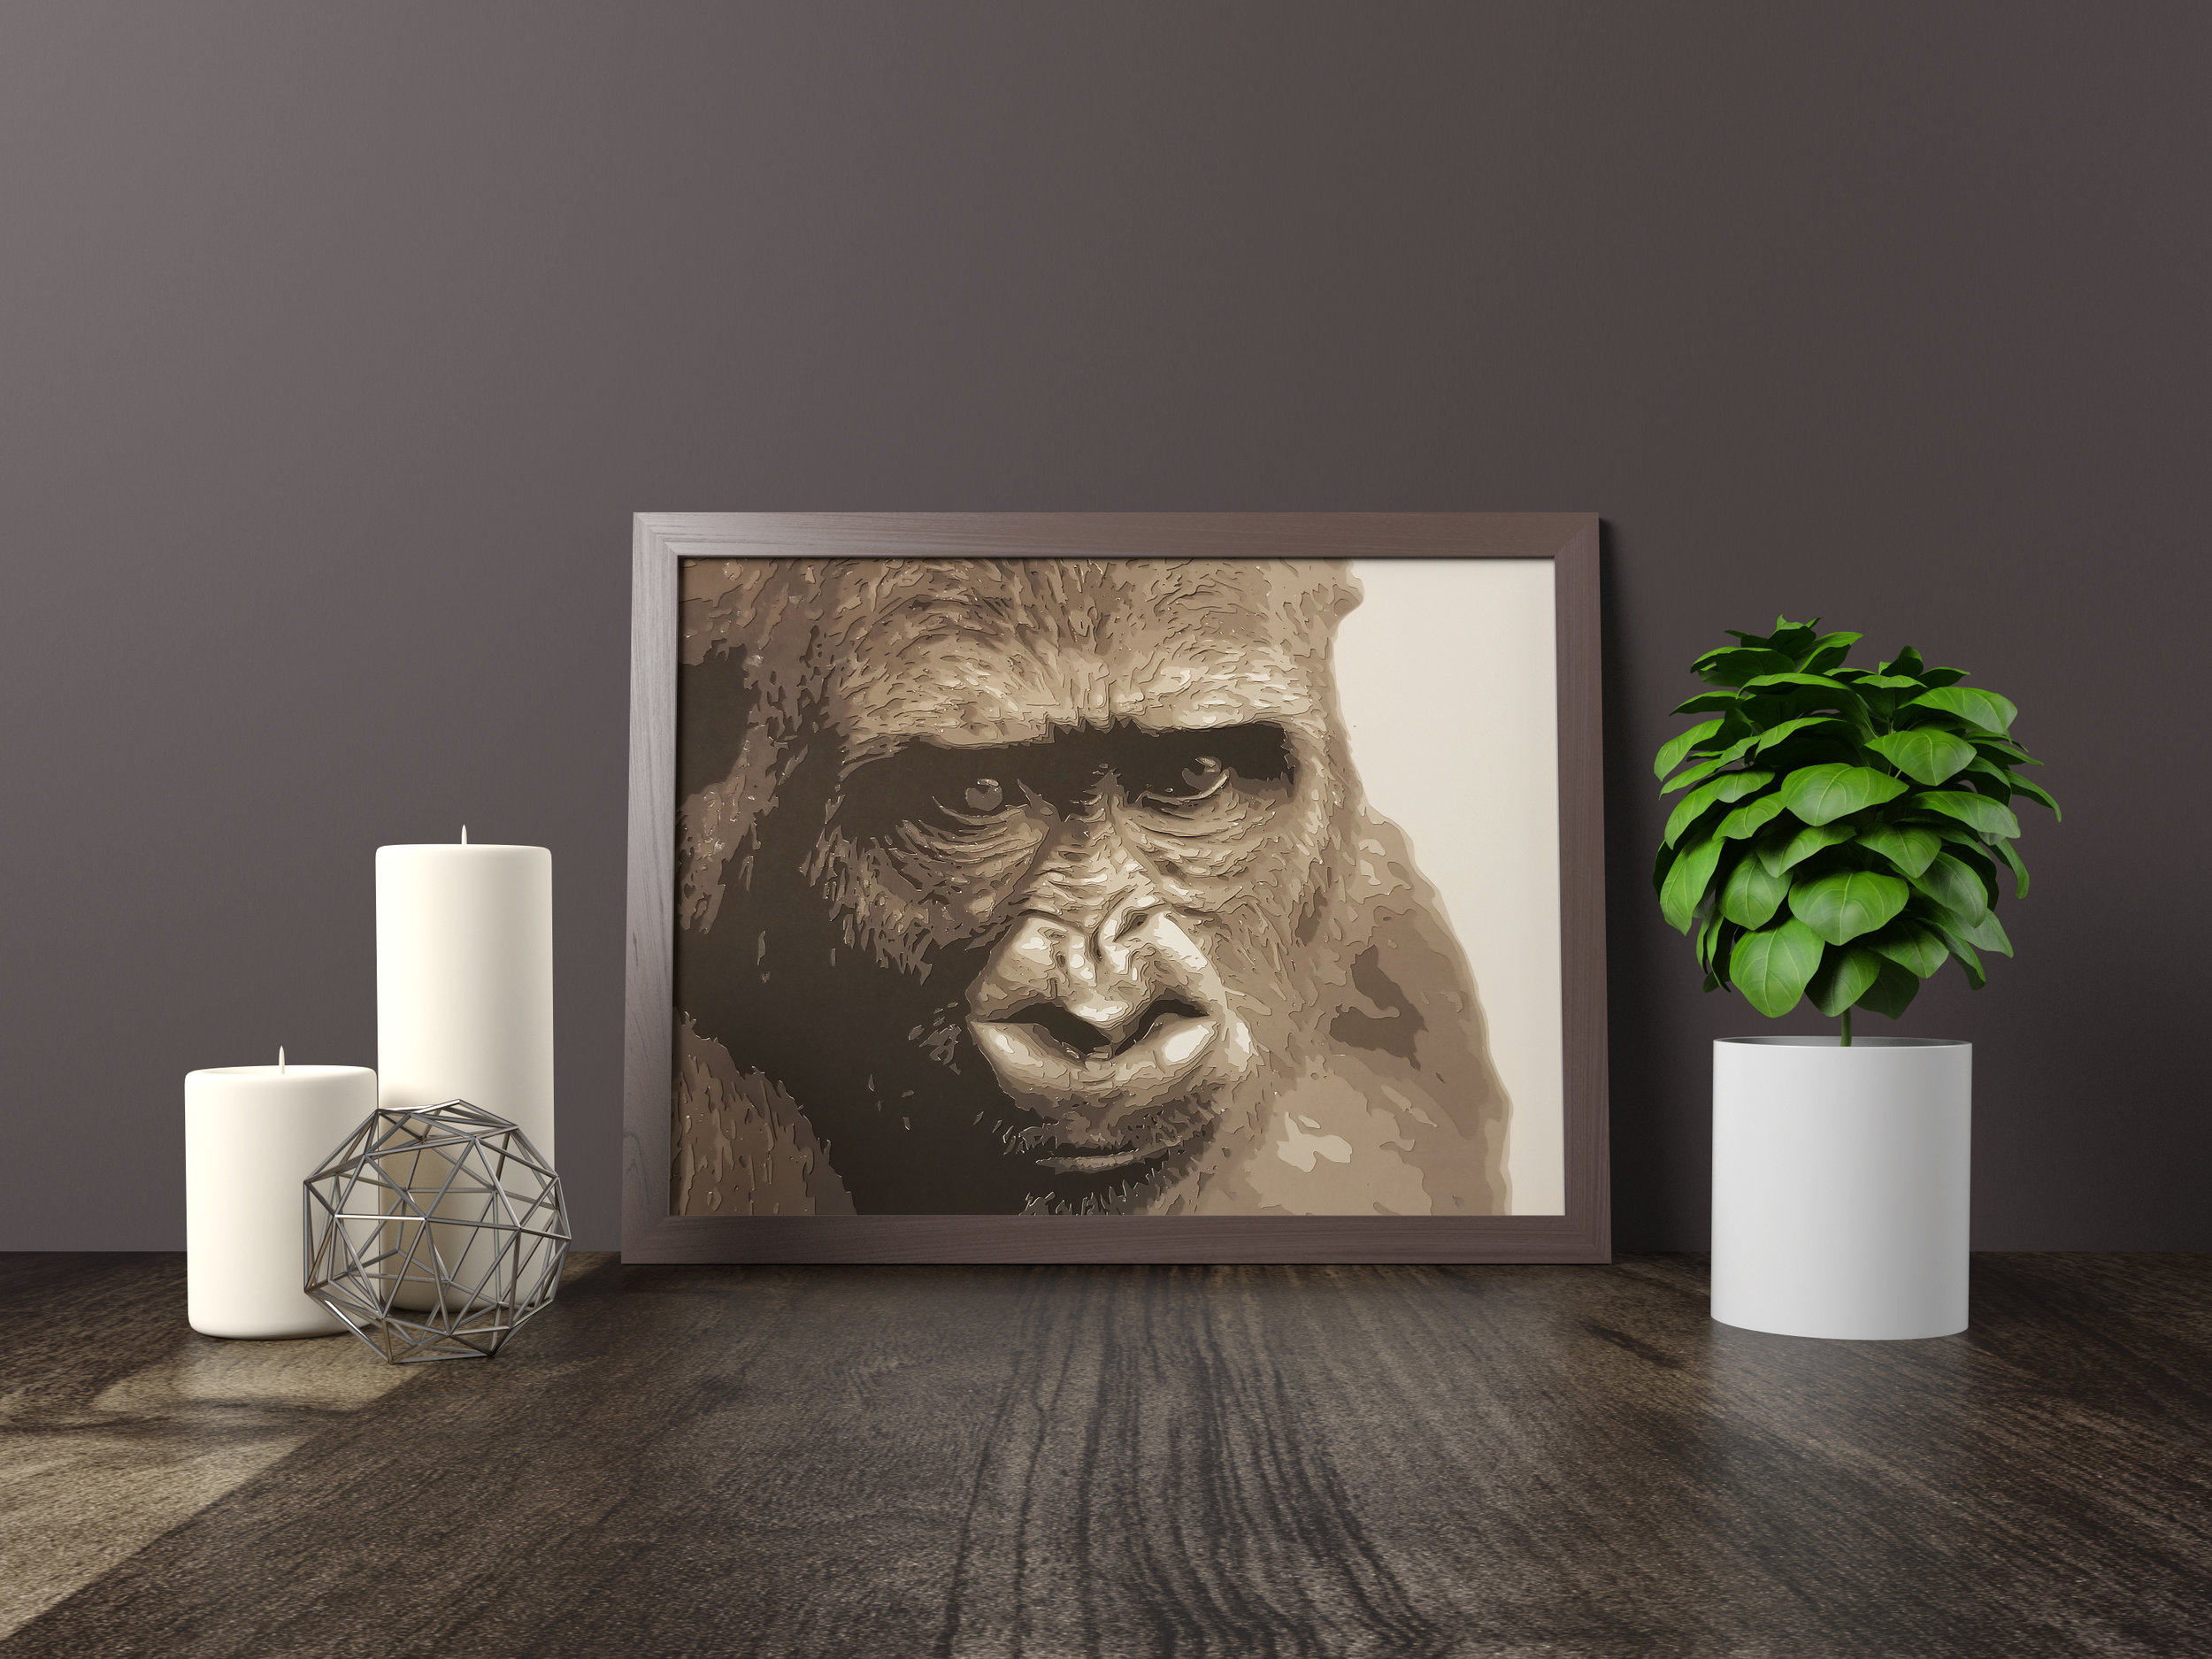 Gorilla - Winner - Honorable Mention, Omaha Artists, Inc. - Gallery 92 Fremont Show, 2018Original artwork *SOLD* 11